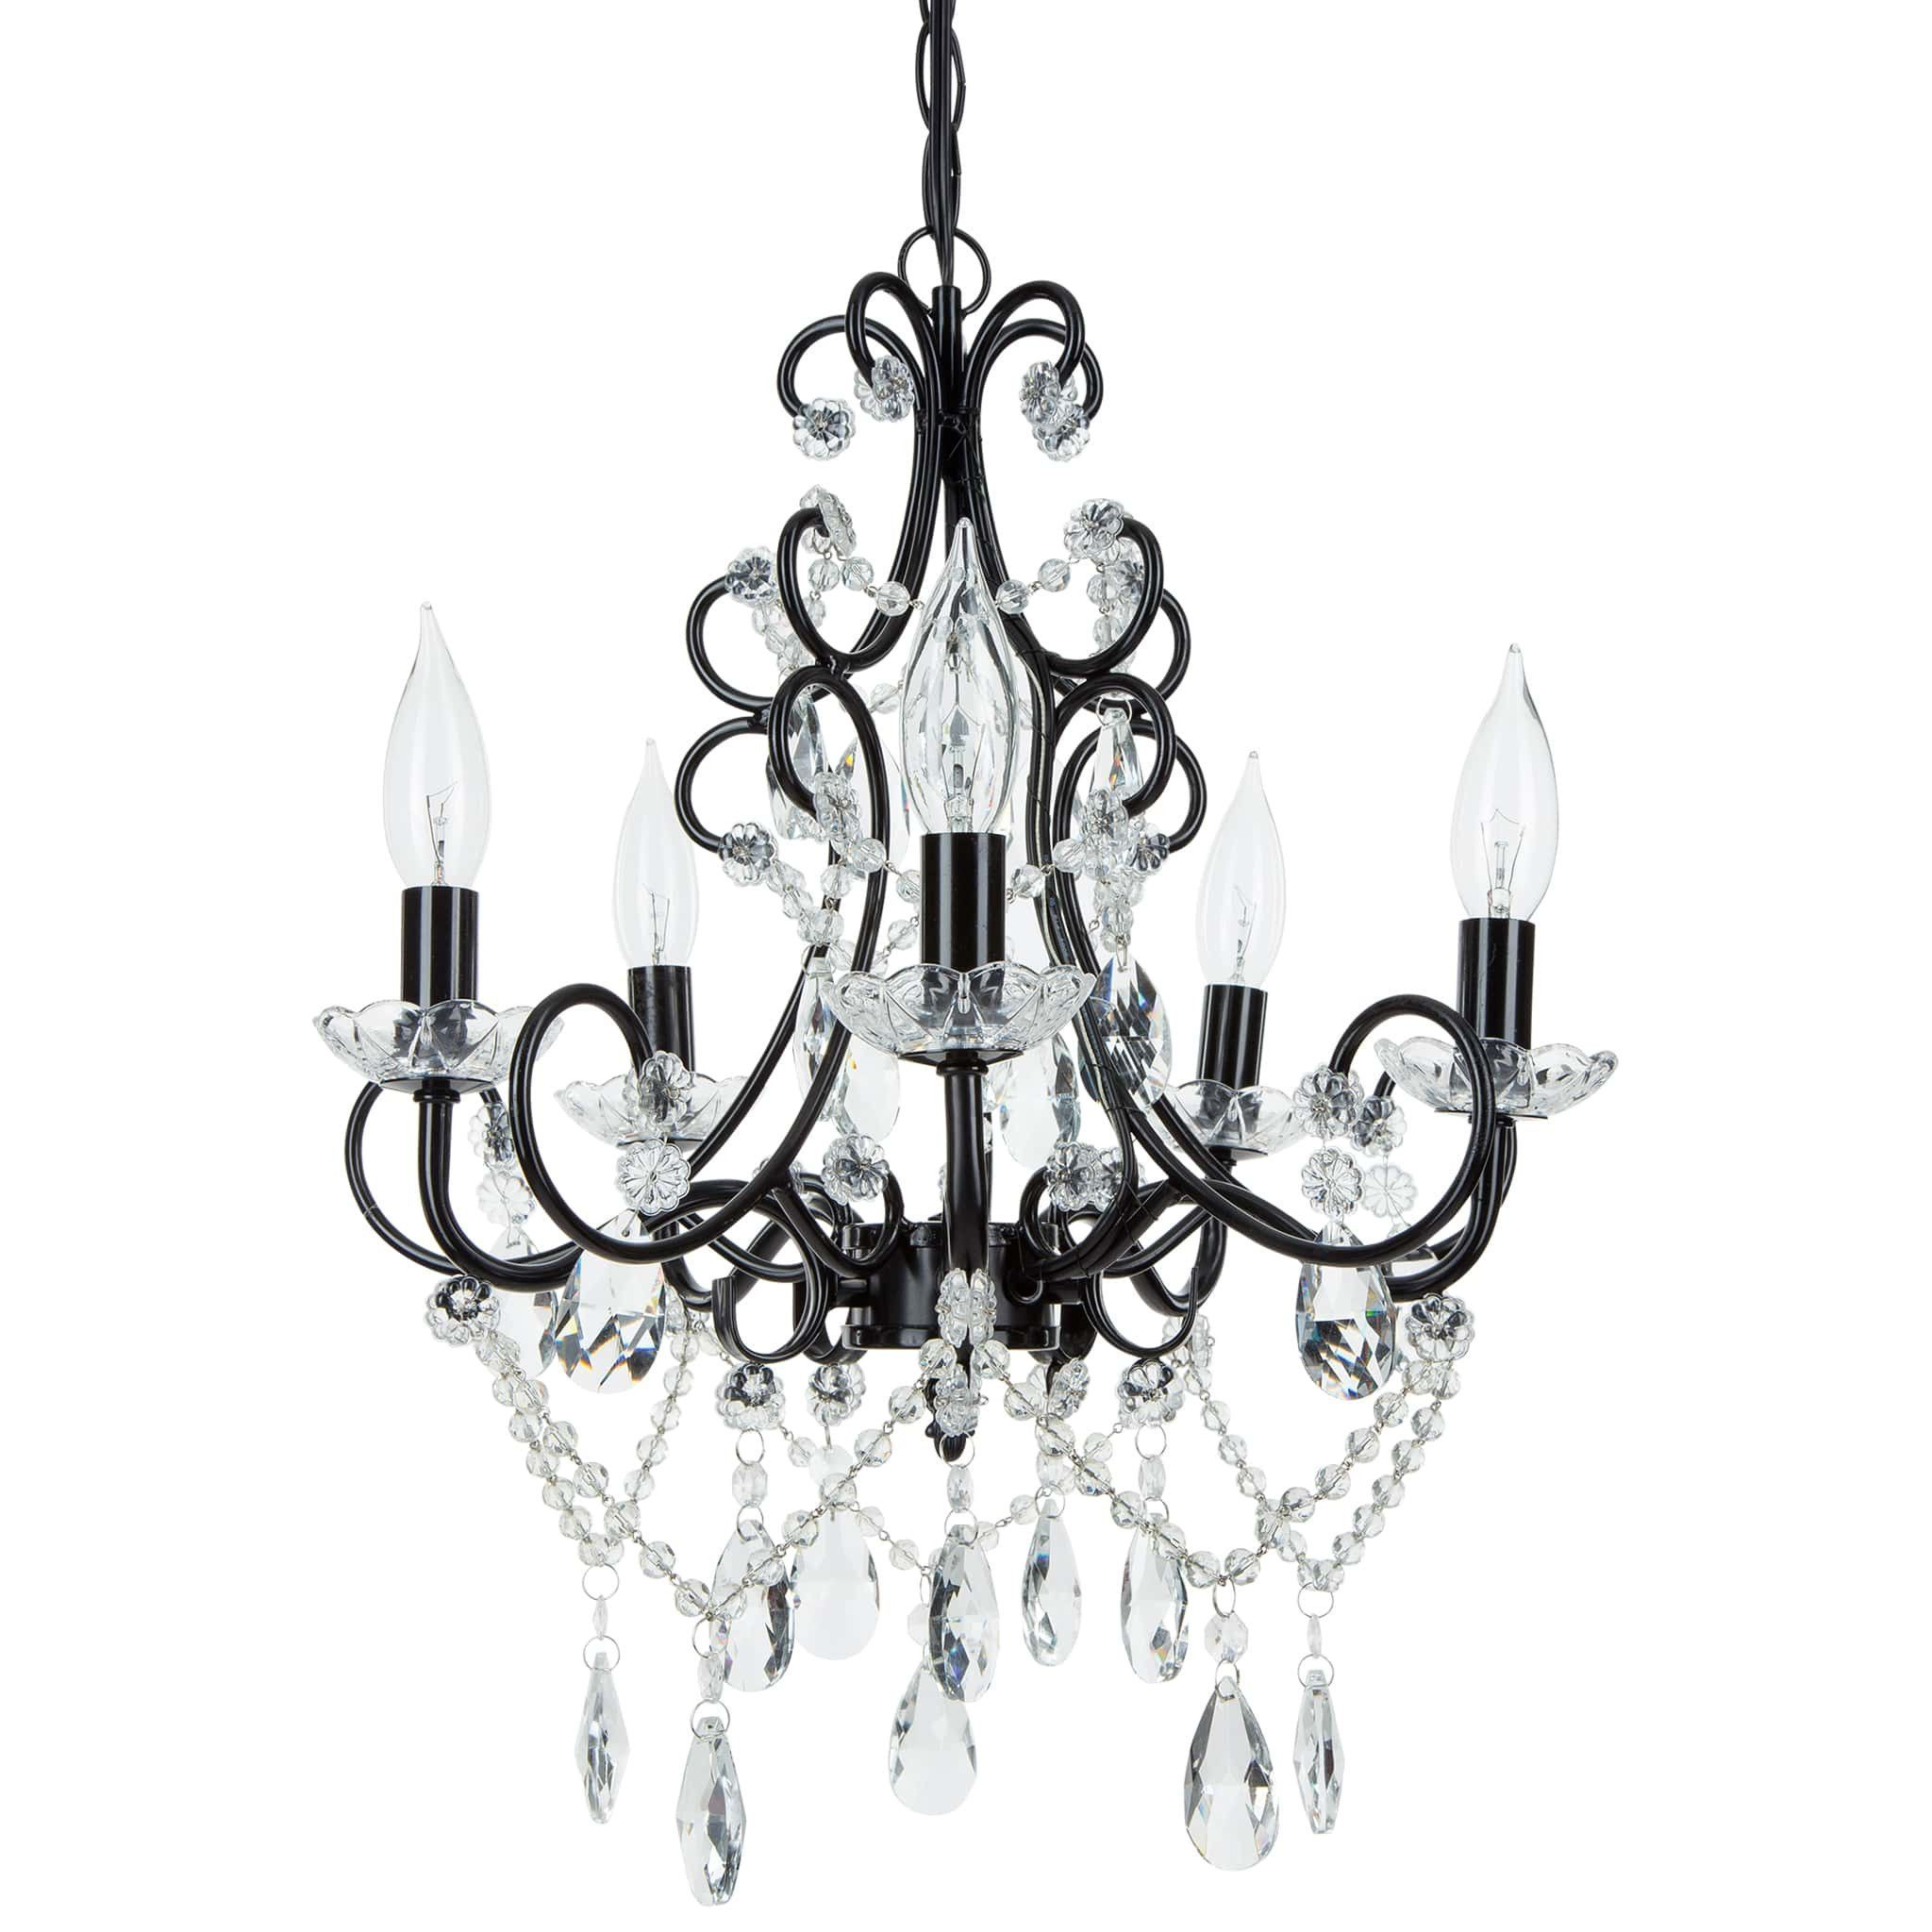 5 Light Classic Crystal Plug In Chandelier Black In